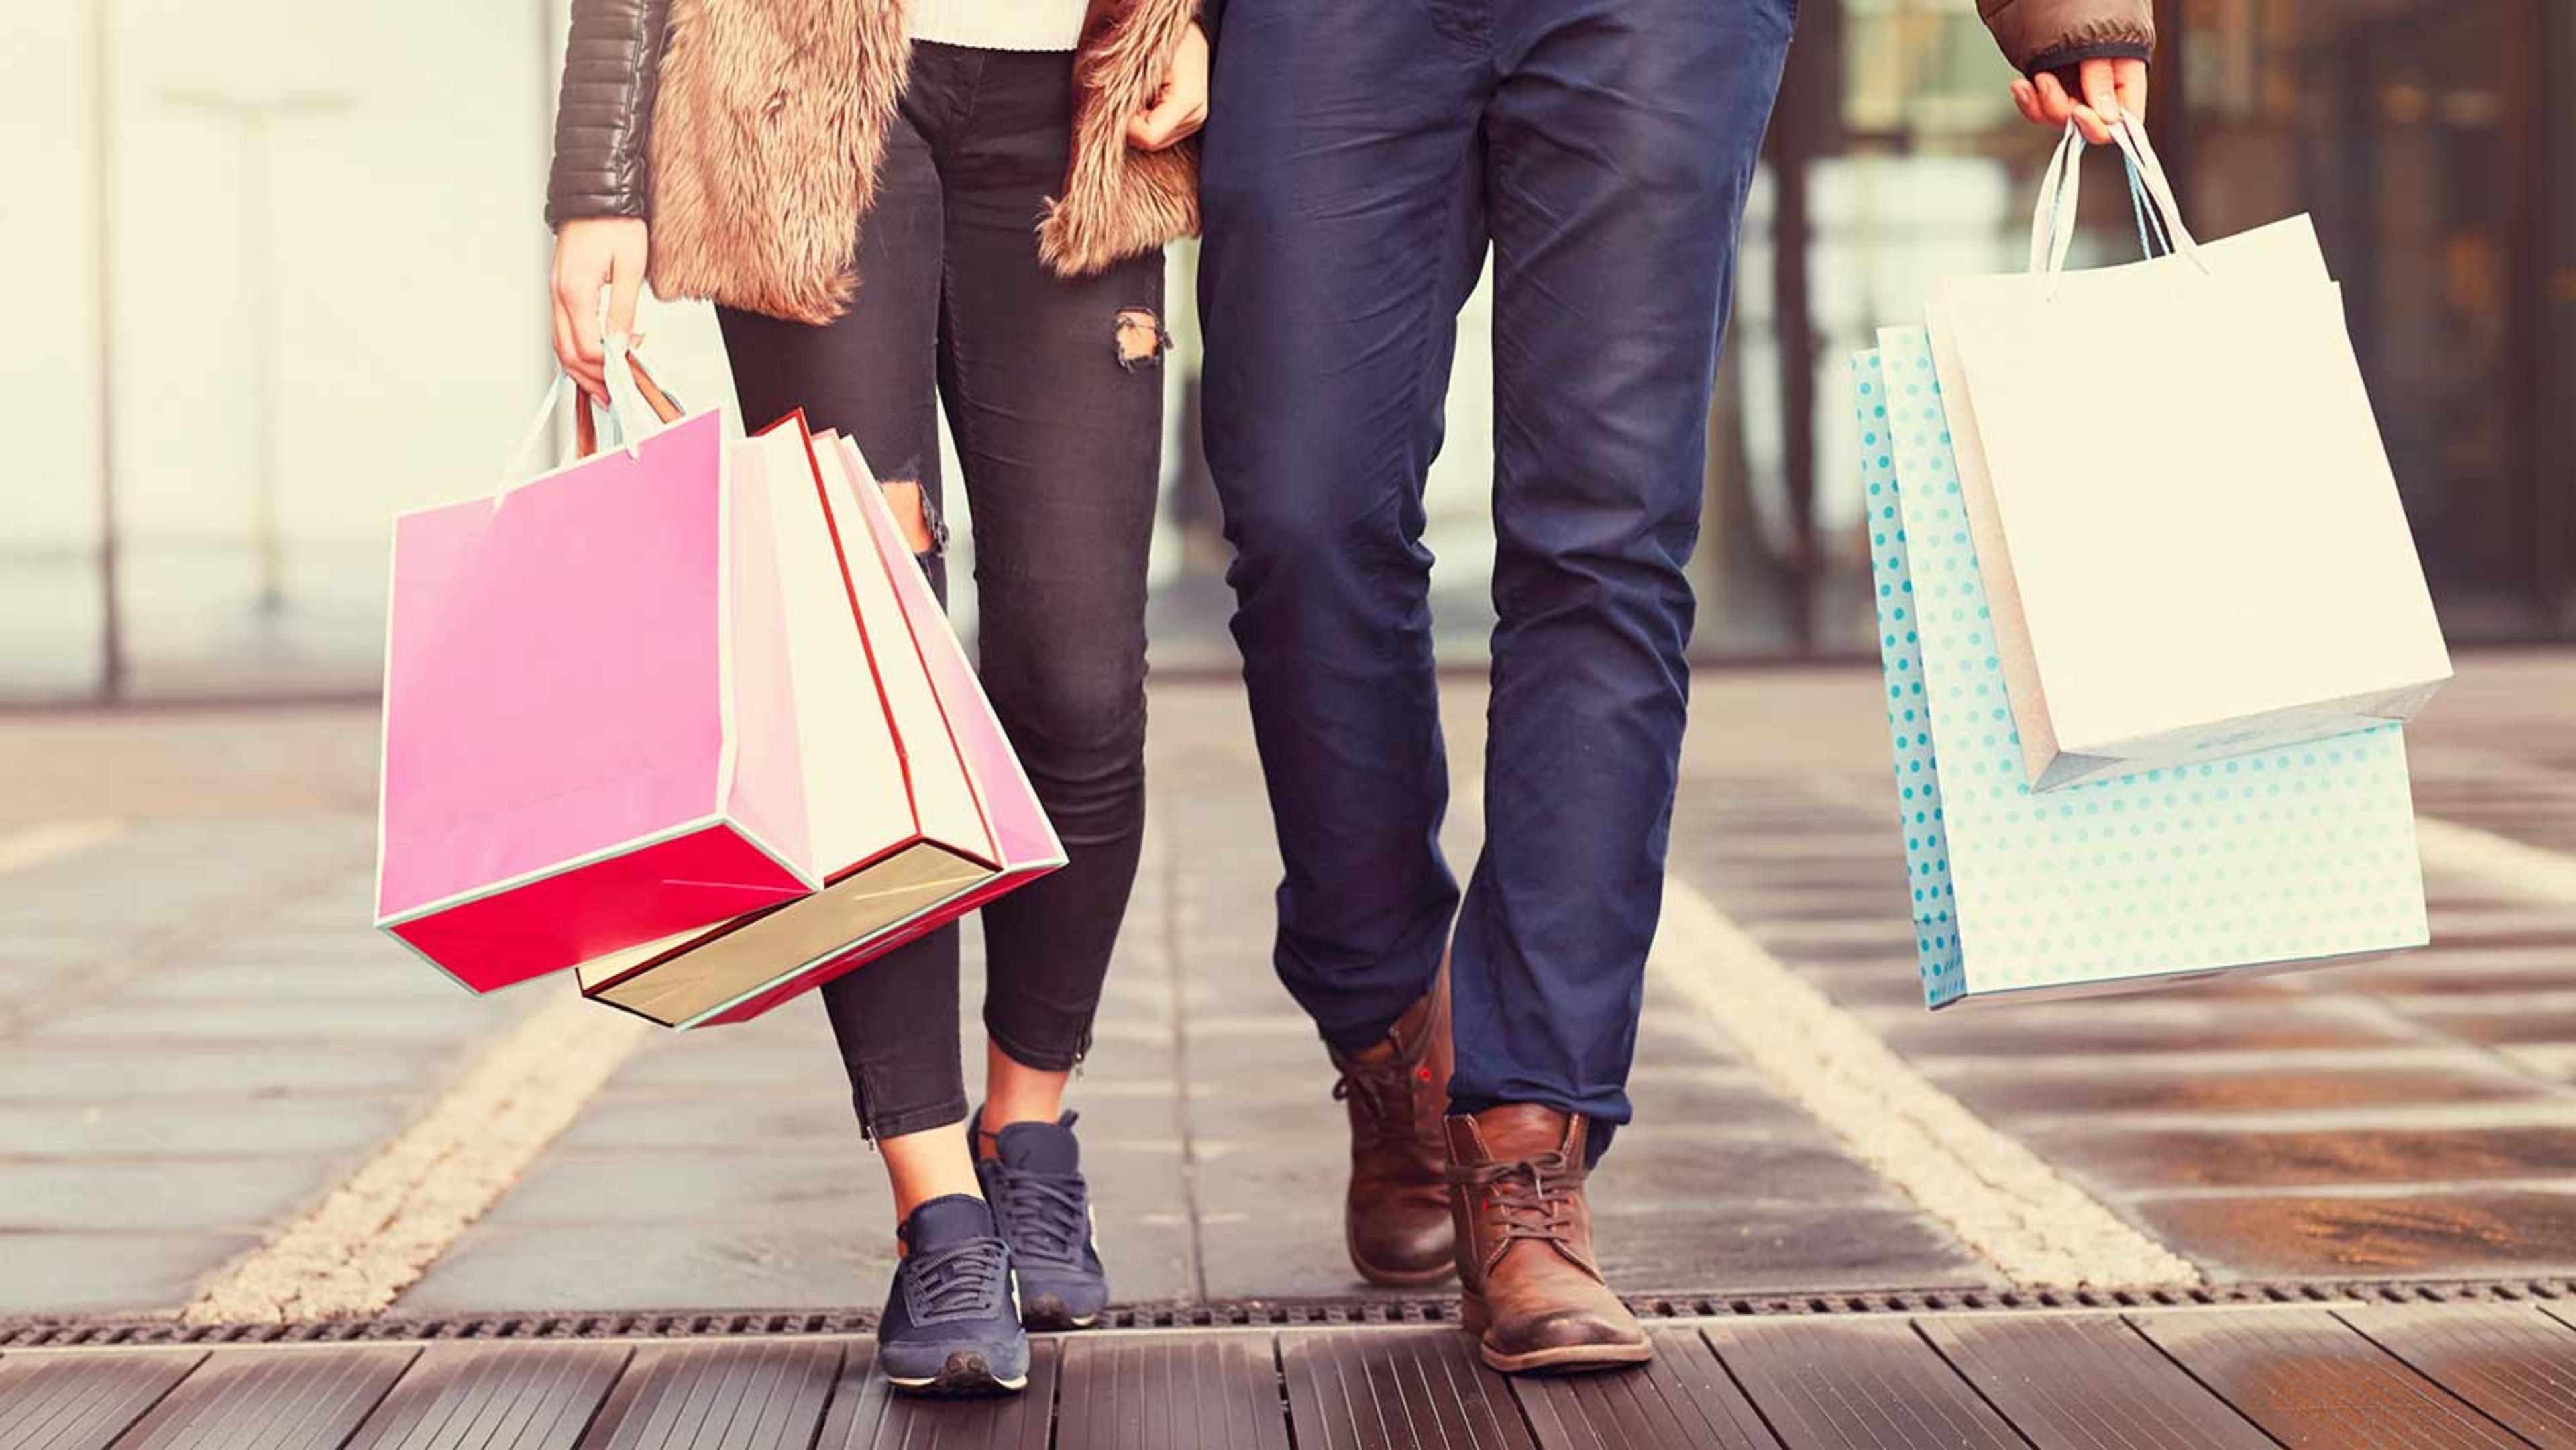 Couple walking along street holding shopping bags